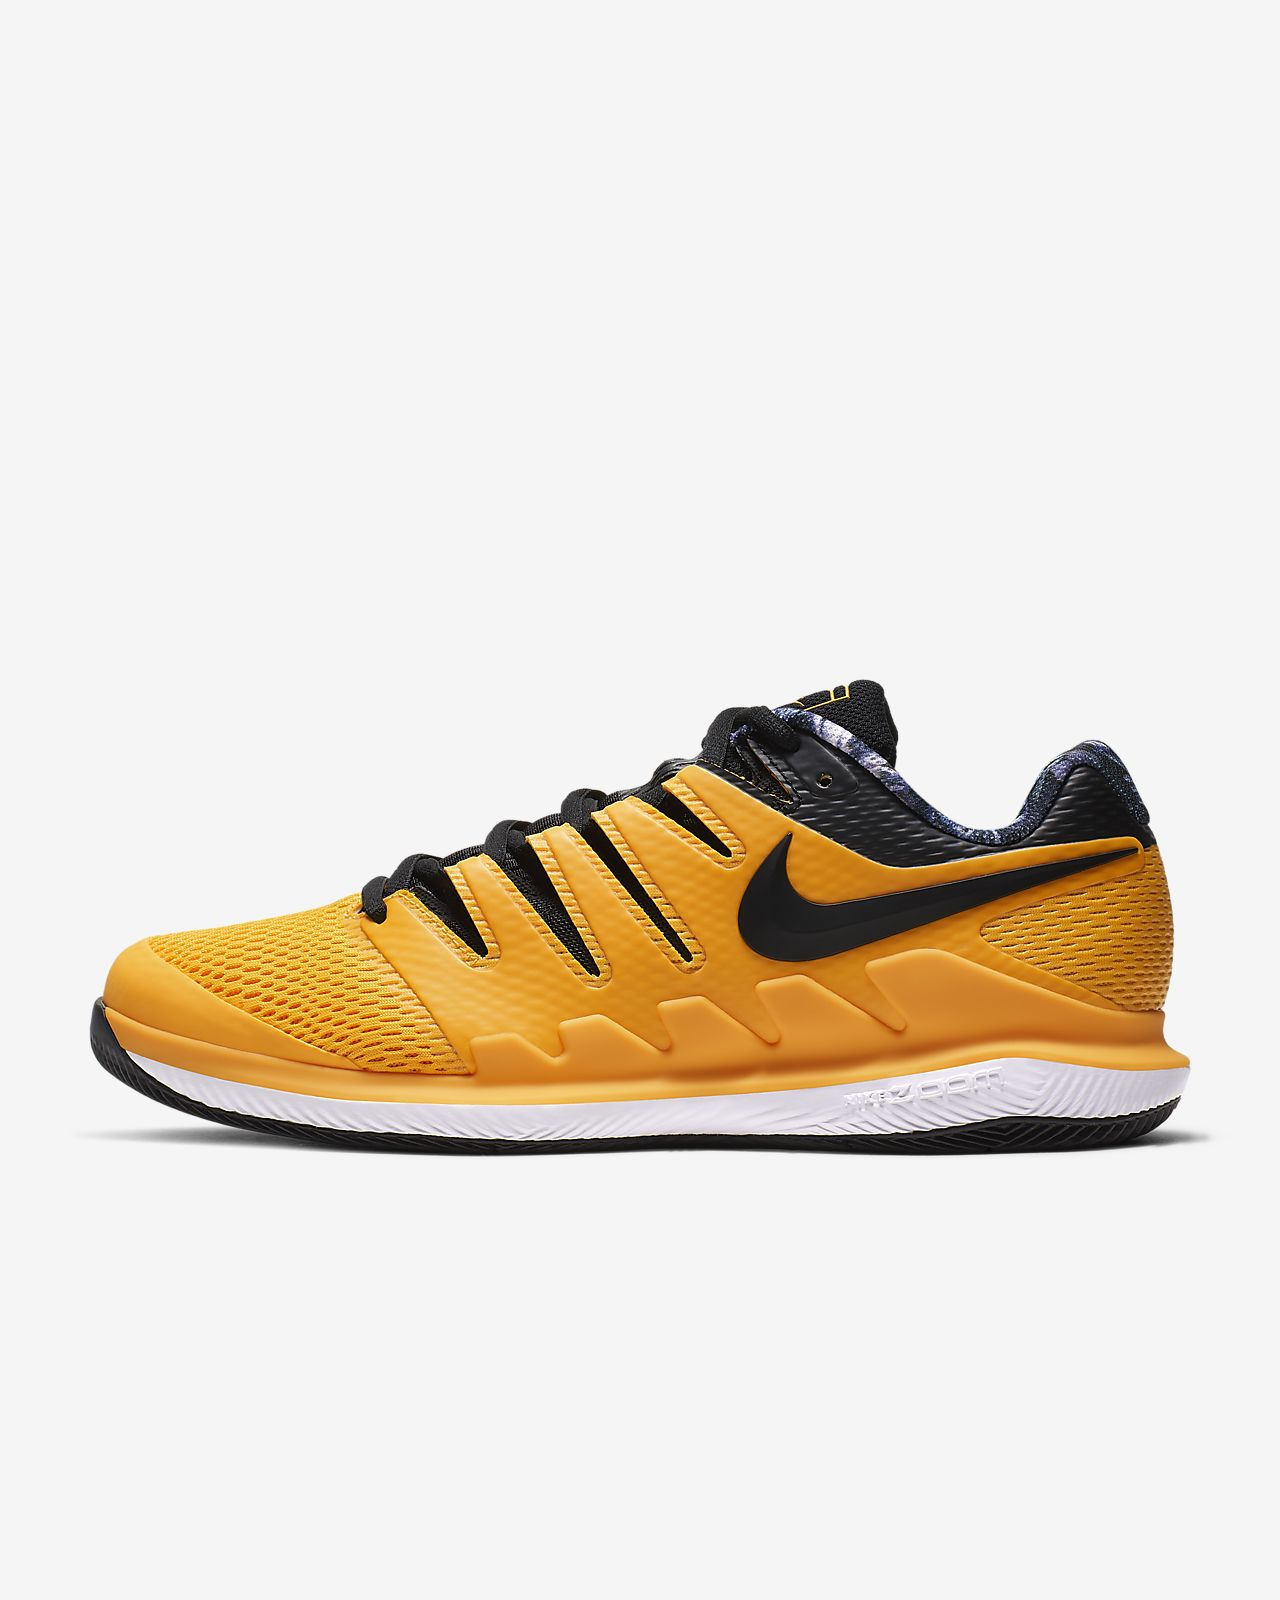 uk availability 5939f 66070 ... Scarpa da tennis per campi in cemento NikeCourt Air Zoom Vapor X - Uomo